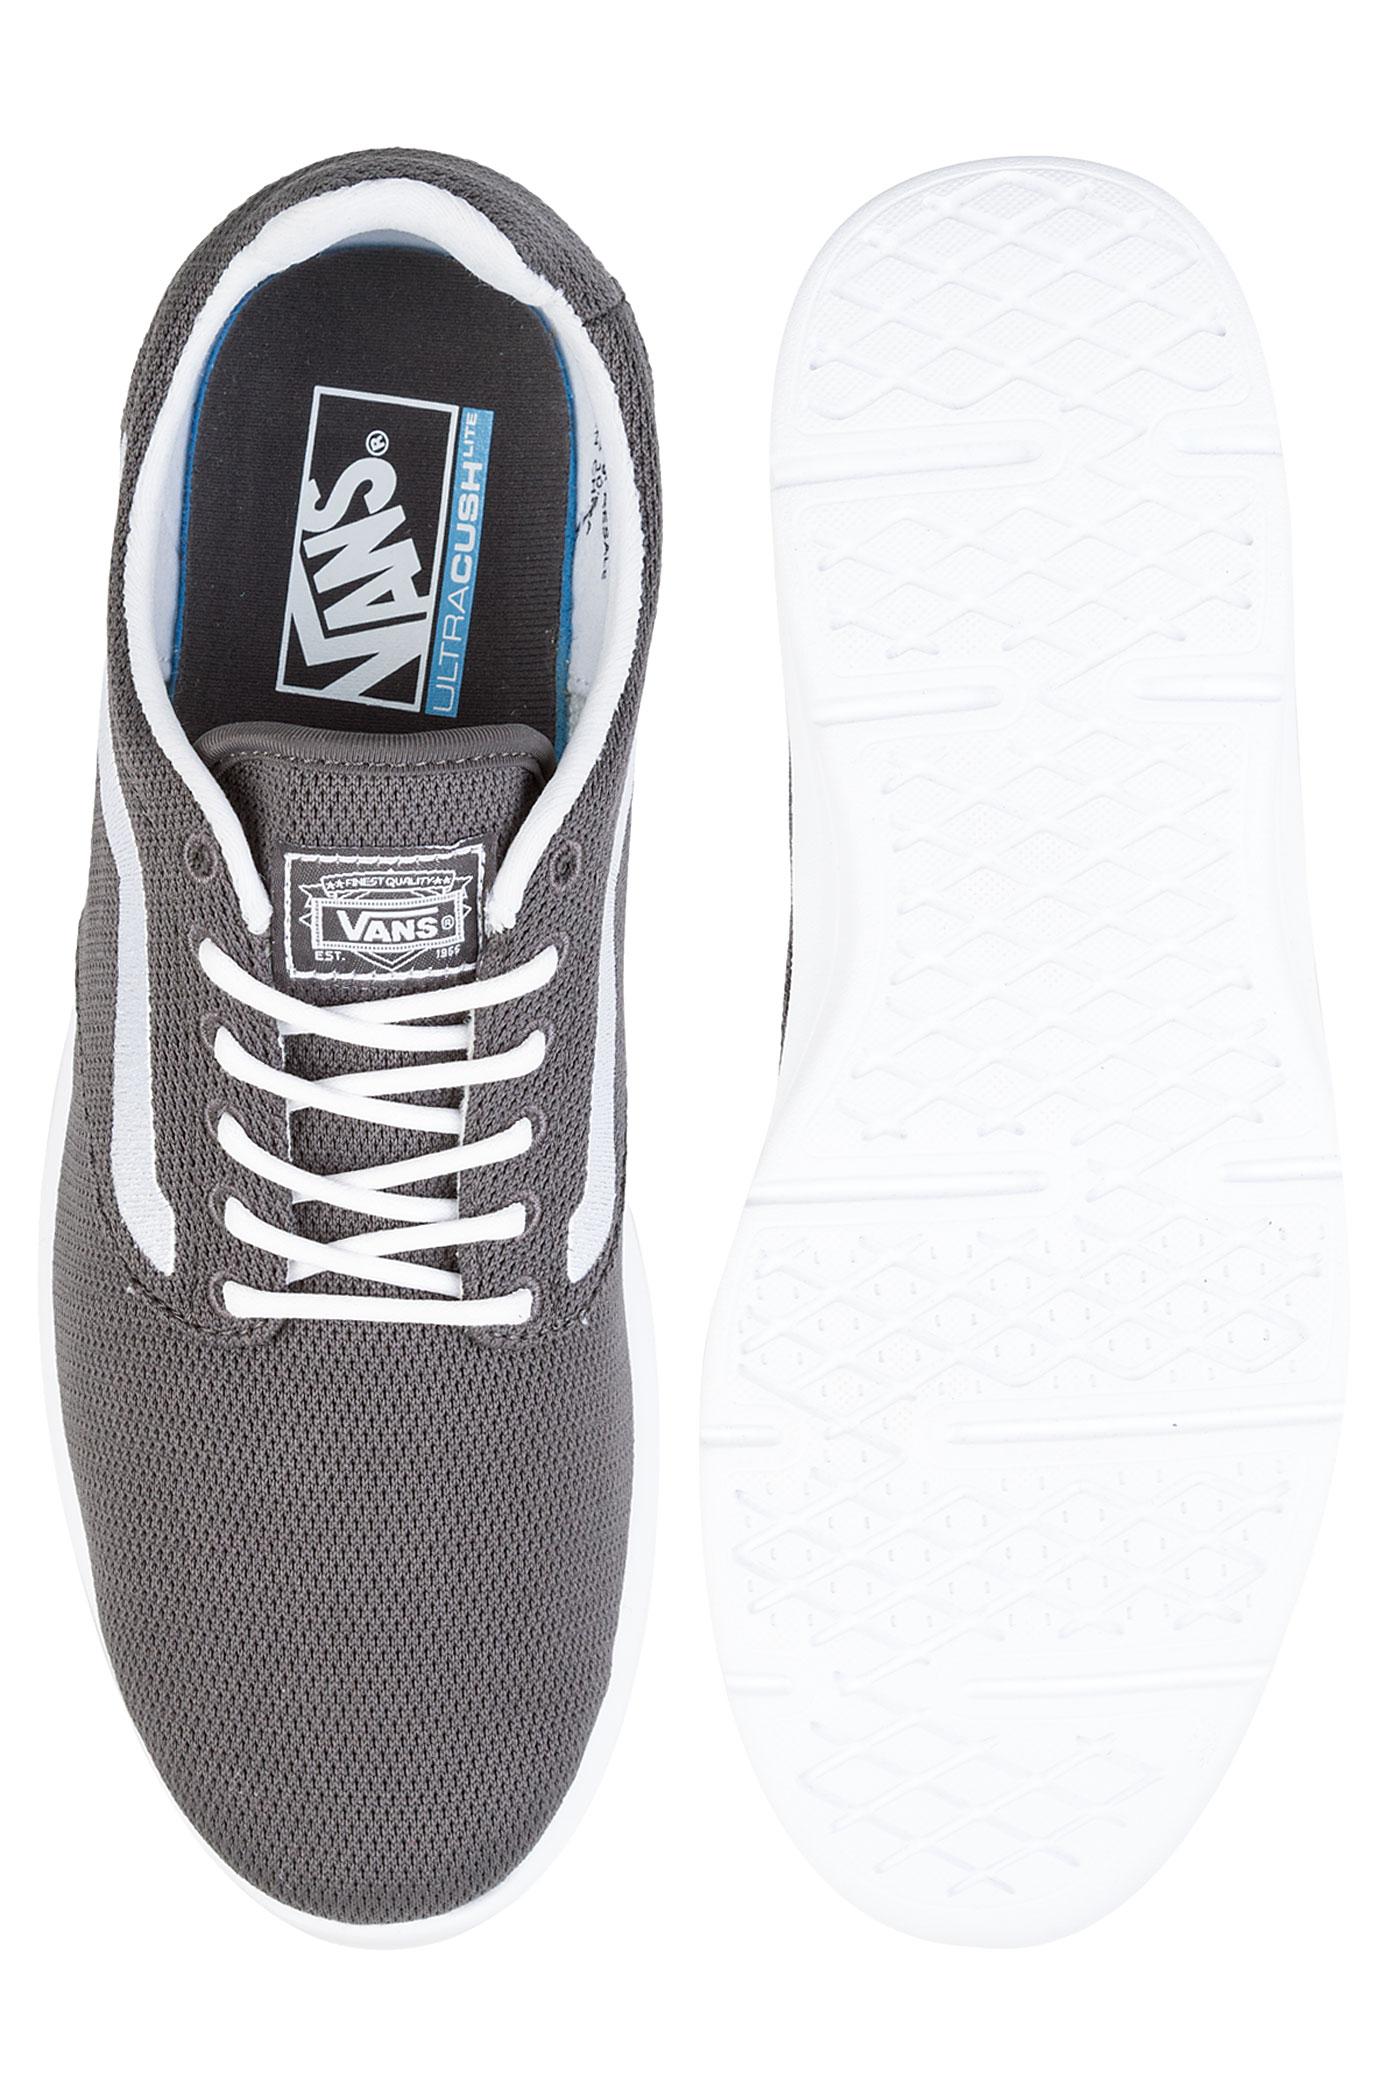 Vans Iso 1.5 Shoe (asphalt) buy at skatedeluxe c3c596dd8